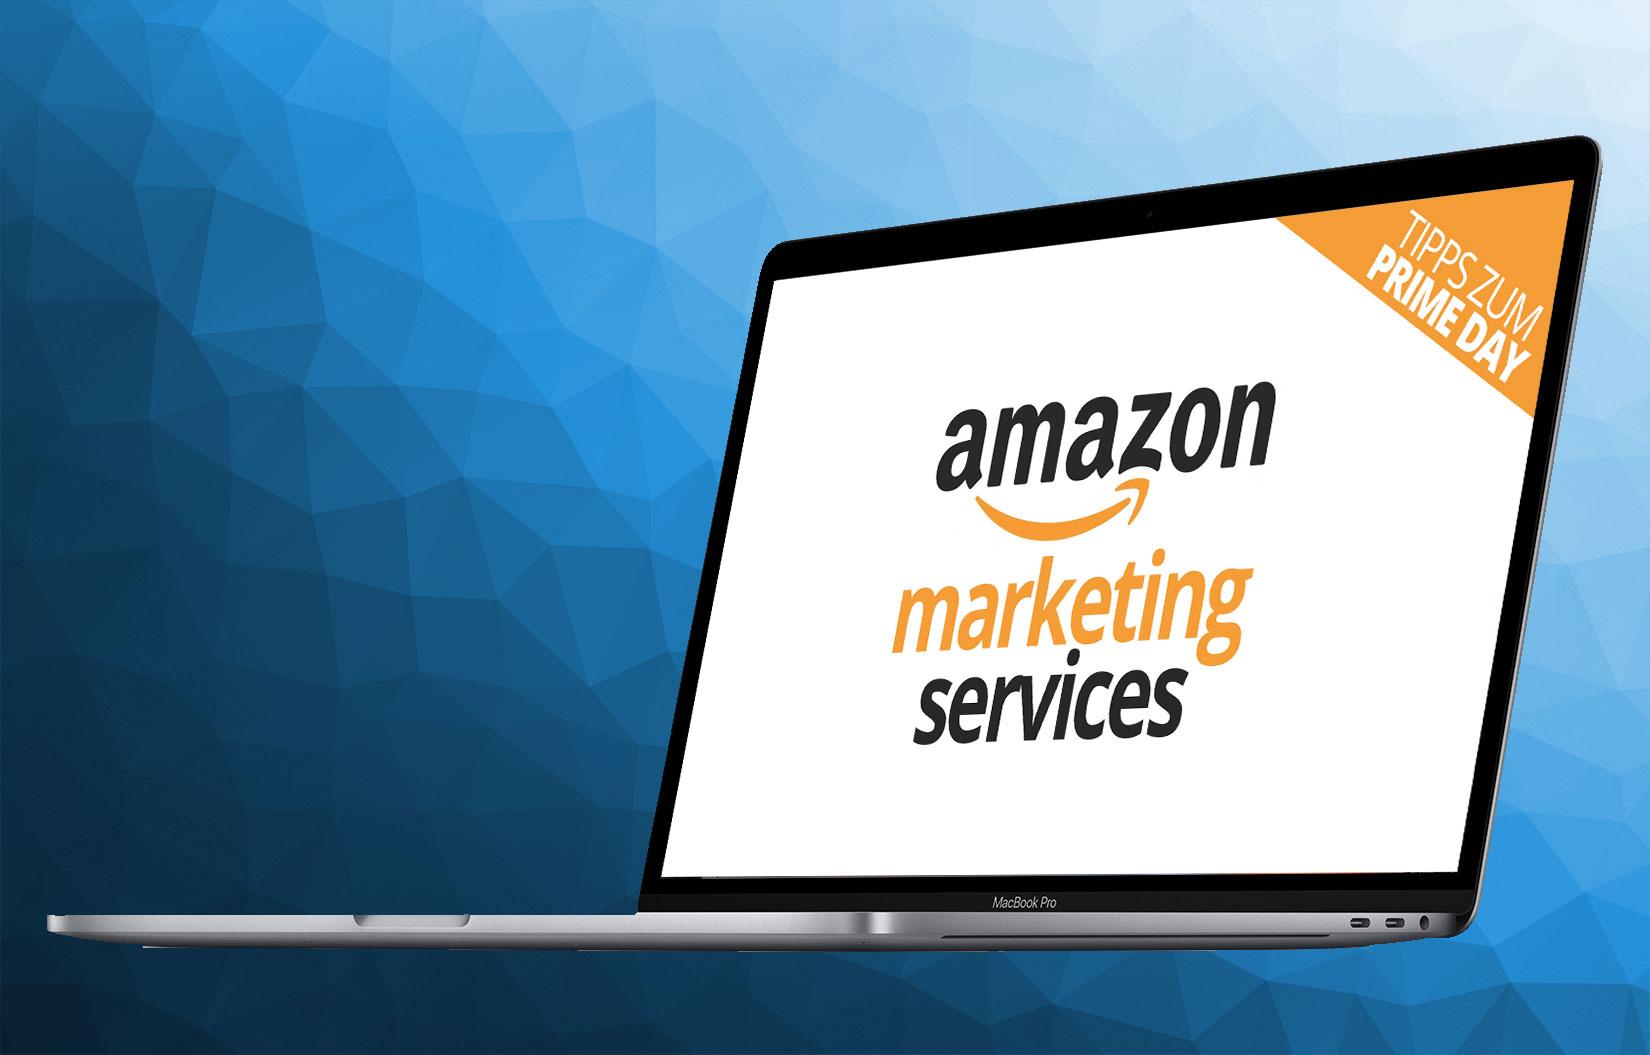 amazon-marketing-service-webinar-tipps-prime-day